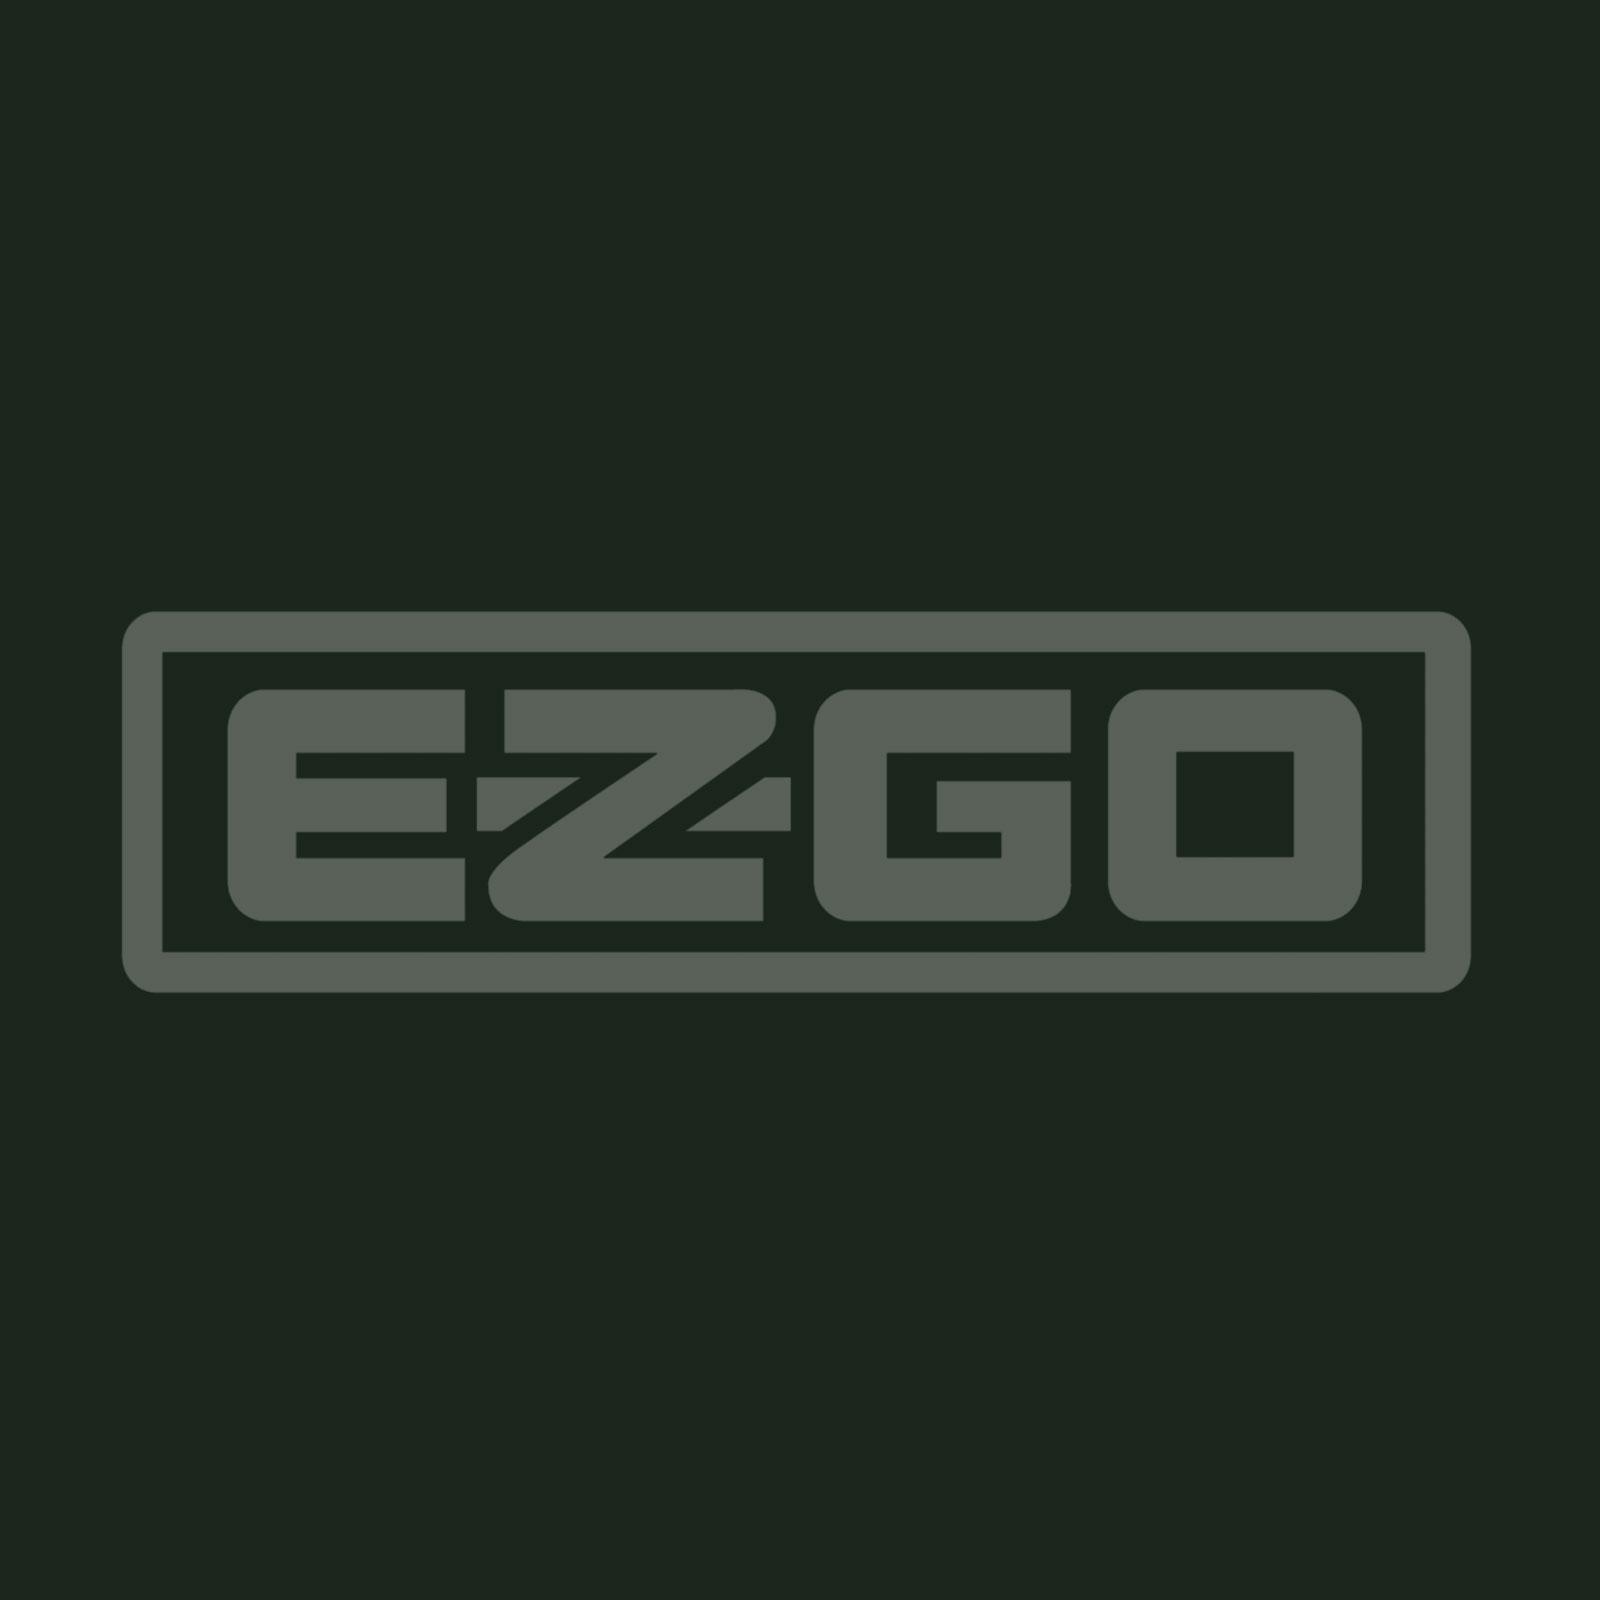 EZGO British Racing Green Placeholder